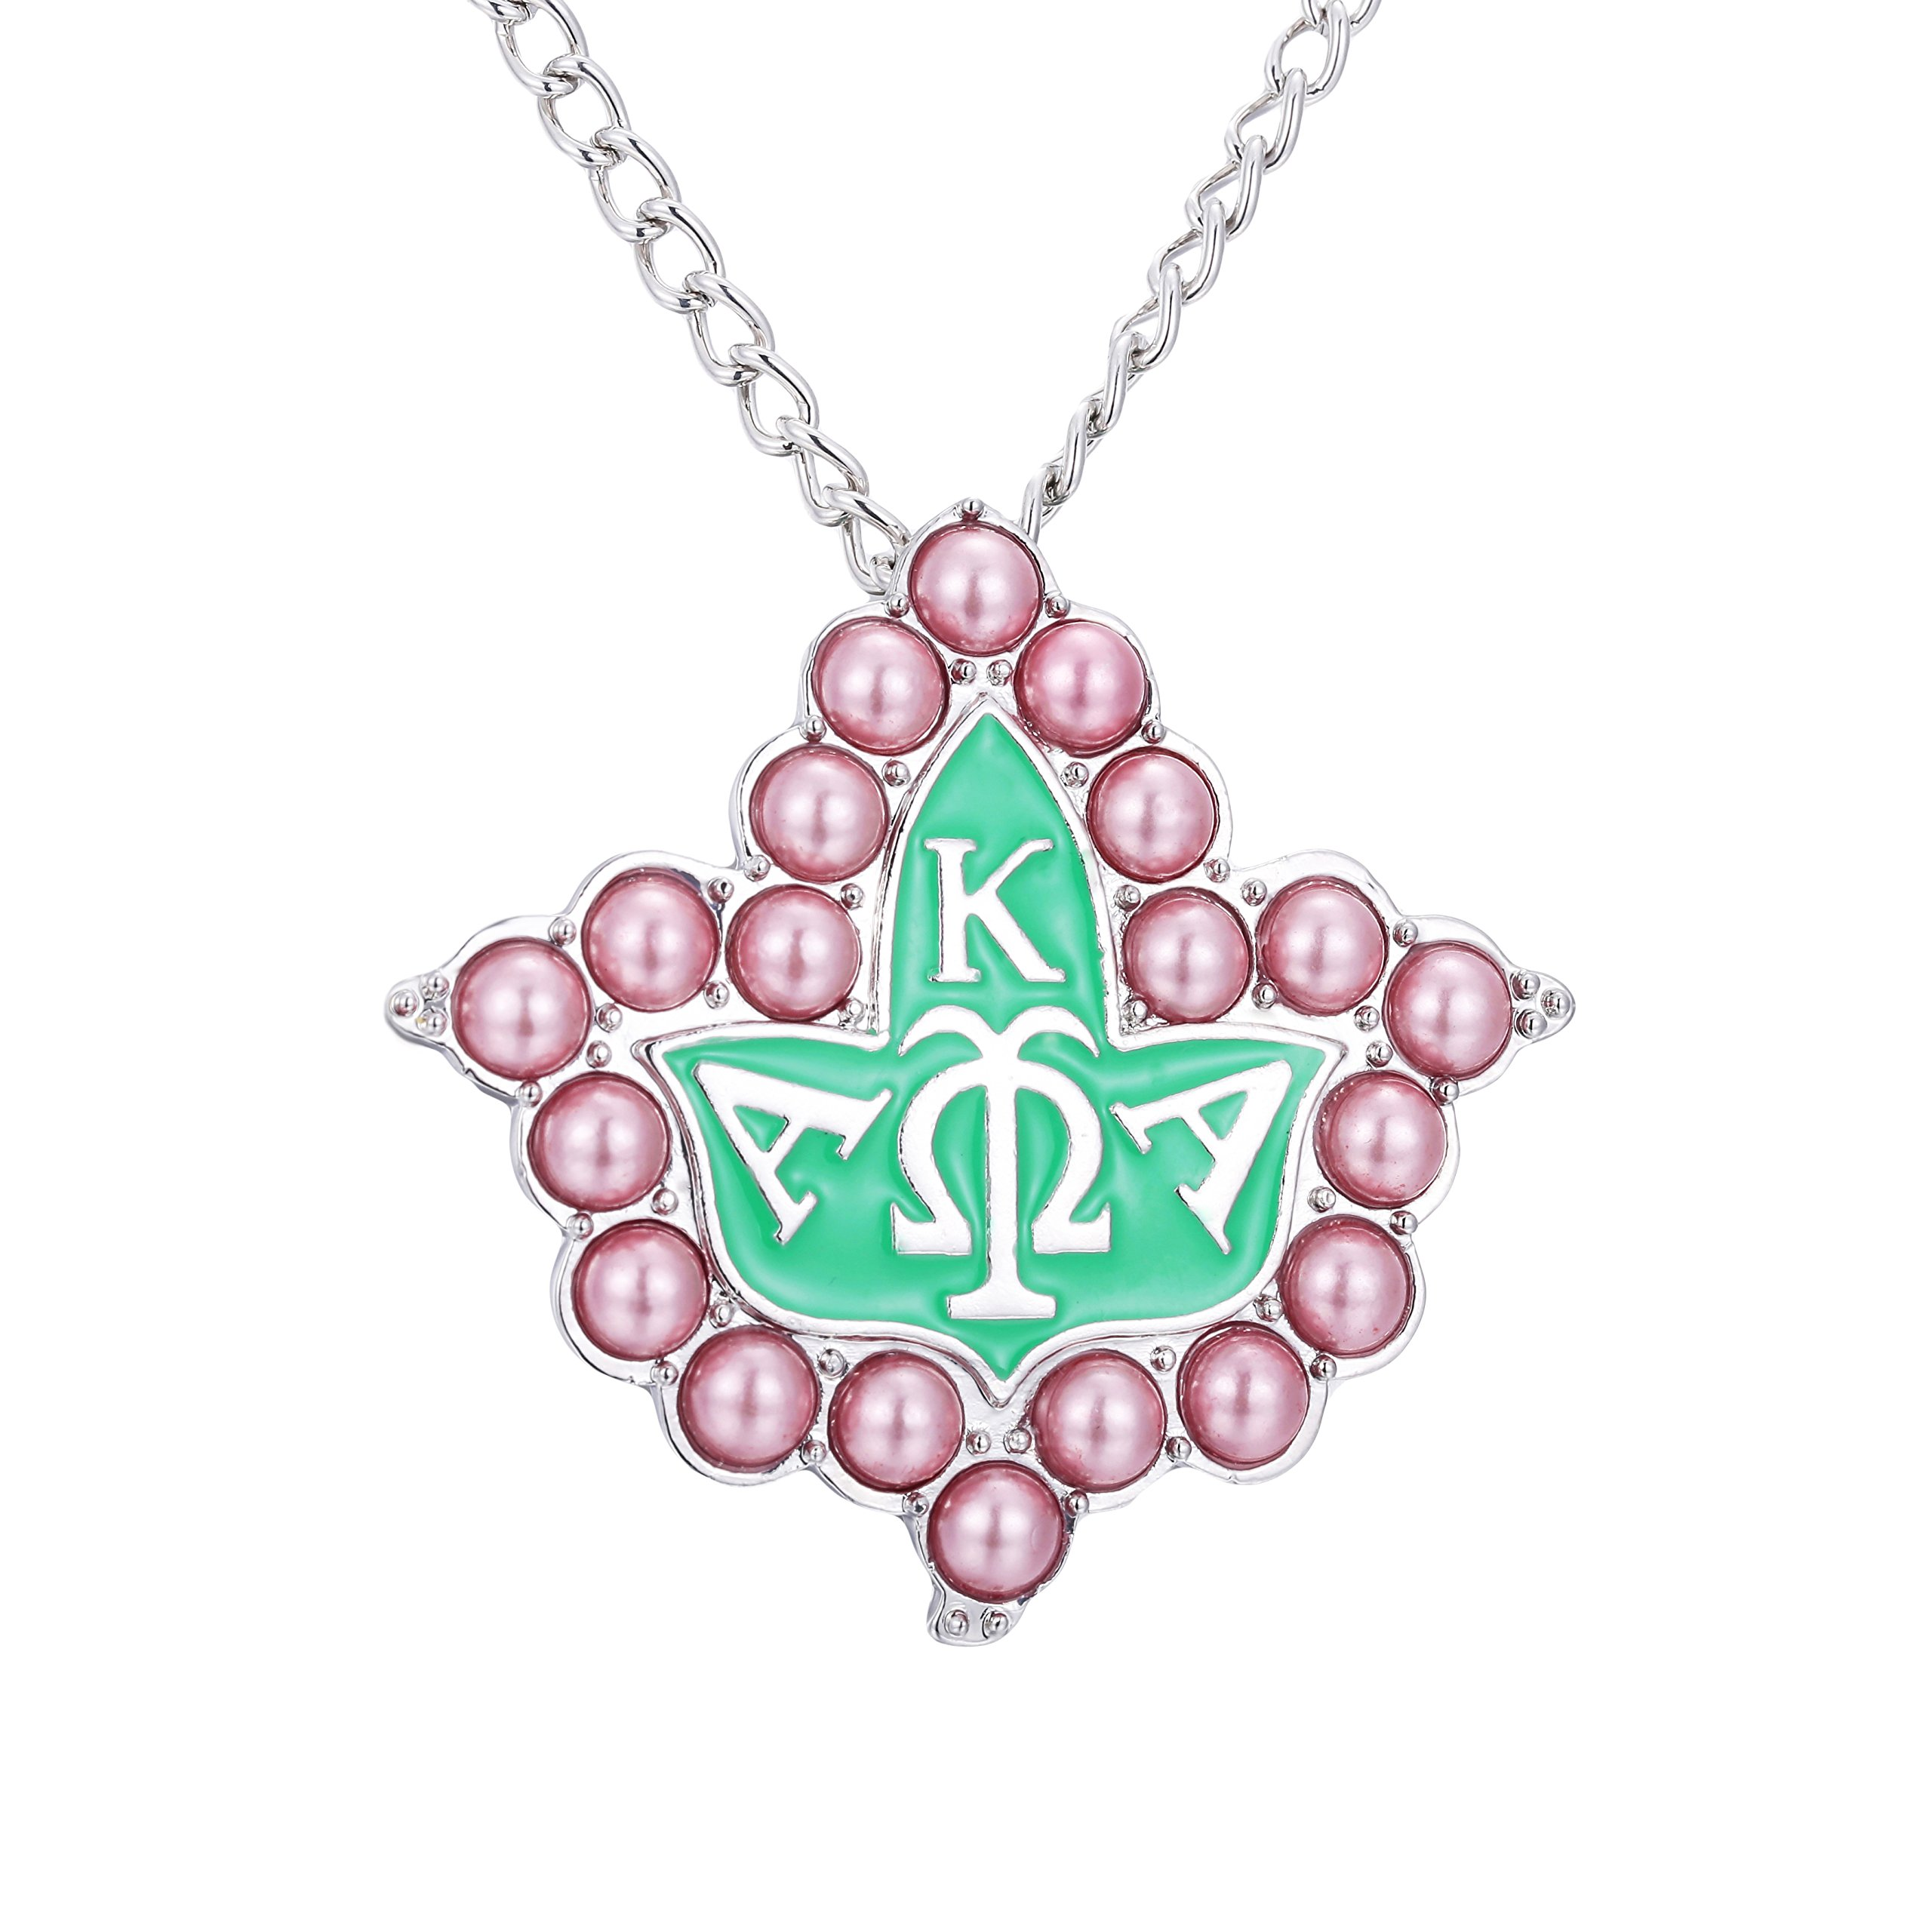 KINGSIN Vintage Pearl Crystal Brooch for Women AKA Sorority Graduation Gifts Alpha Kappa Alpha Paraphernalia Jewelry Leaf Pendant Necklace Chain by KINGSIN (Image #1)